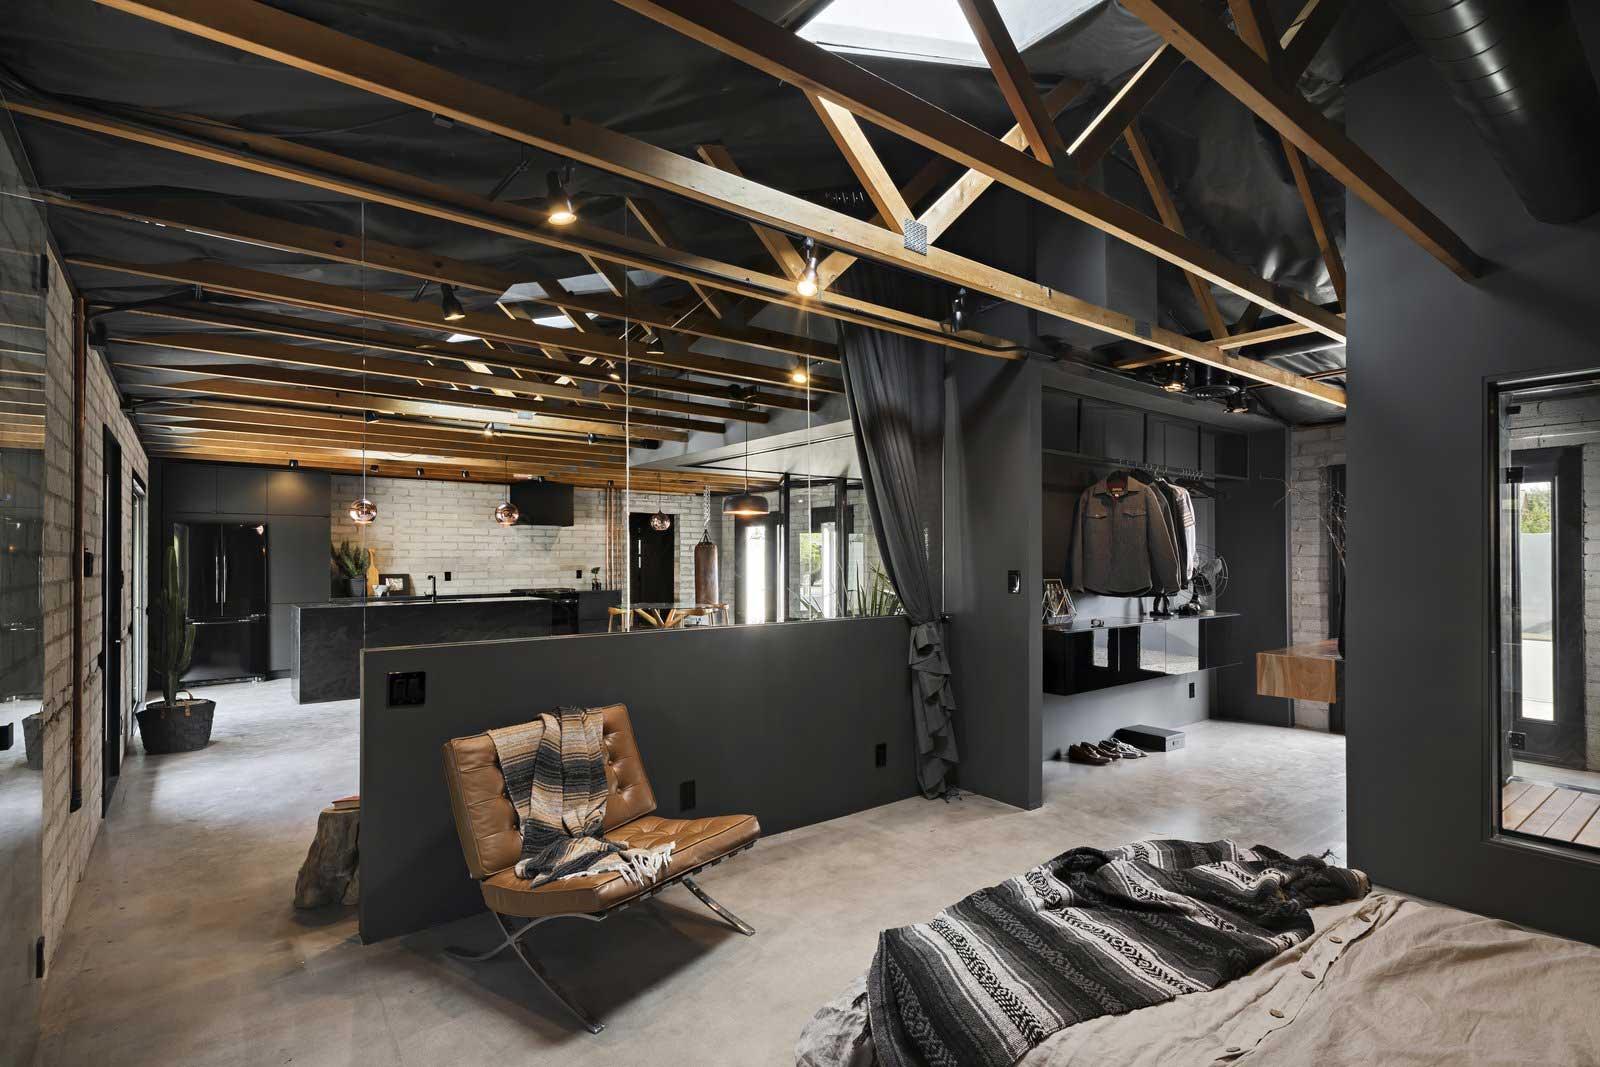 Traum-Loft: The Black House The-Black-House-Airbnb_05